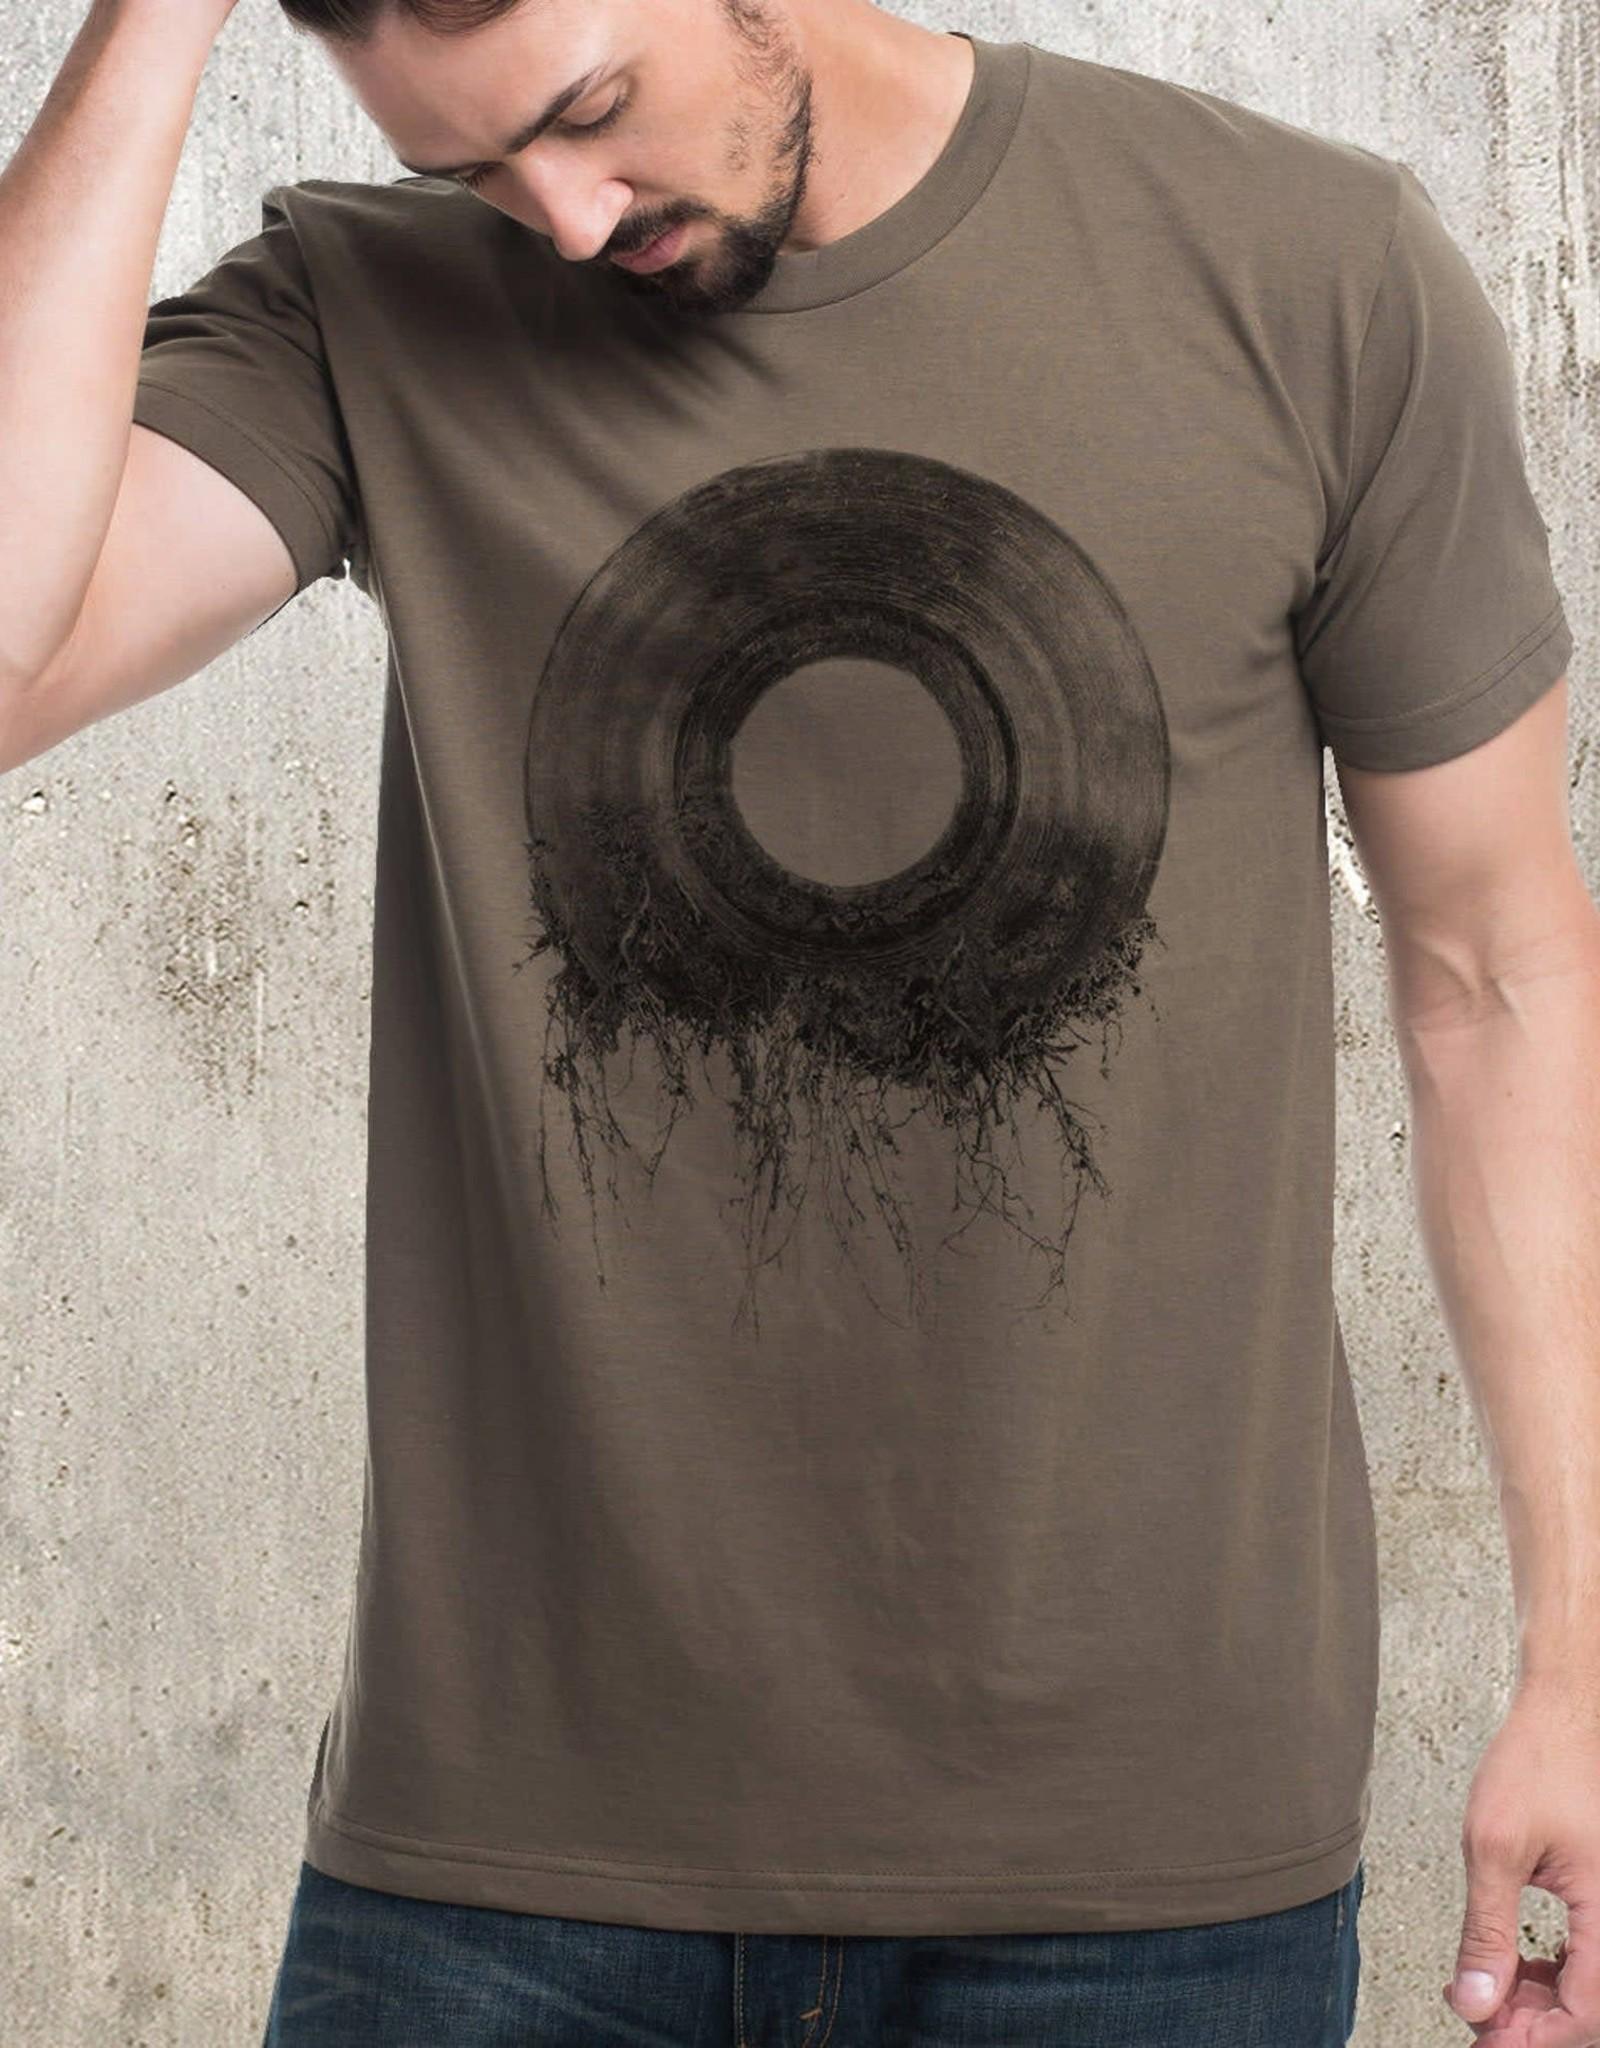 Black Lantern Black Lantern - T-Shirt - Vinyl Record Roots